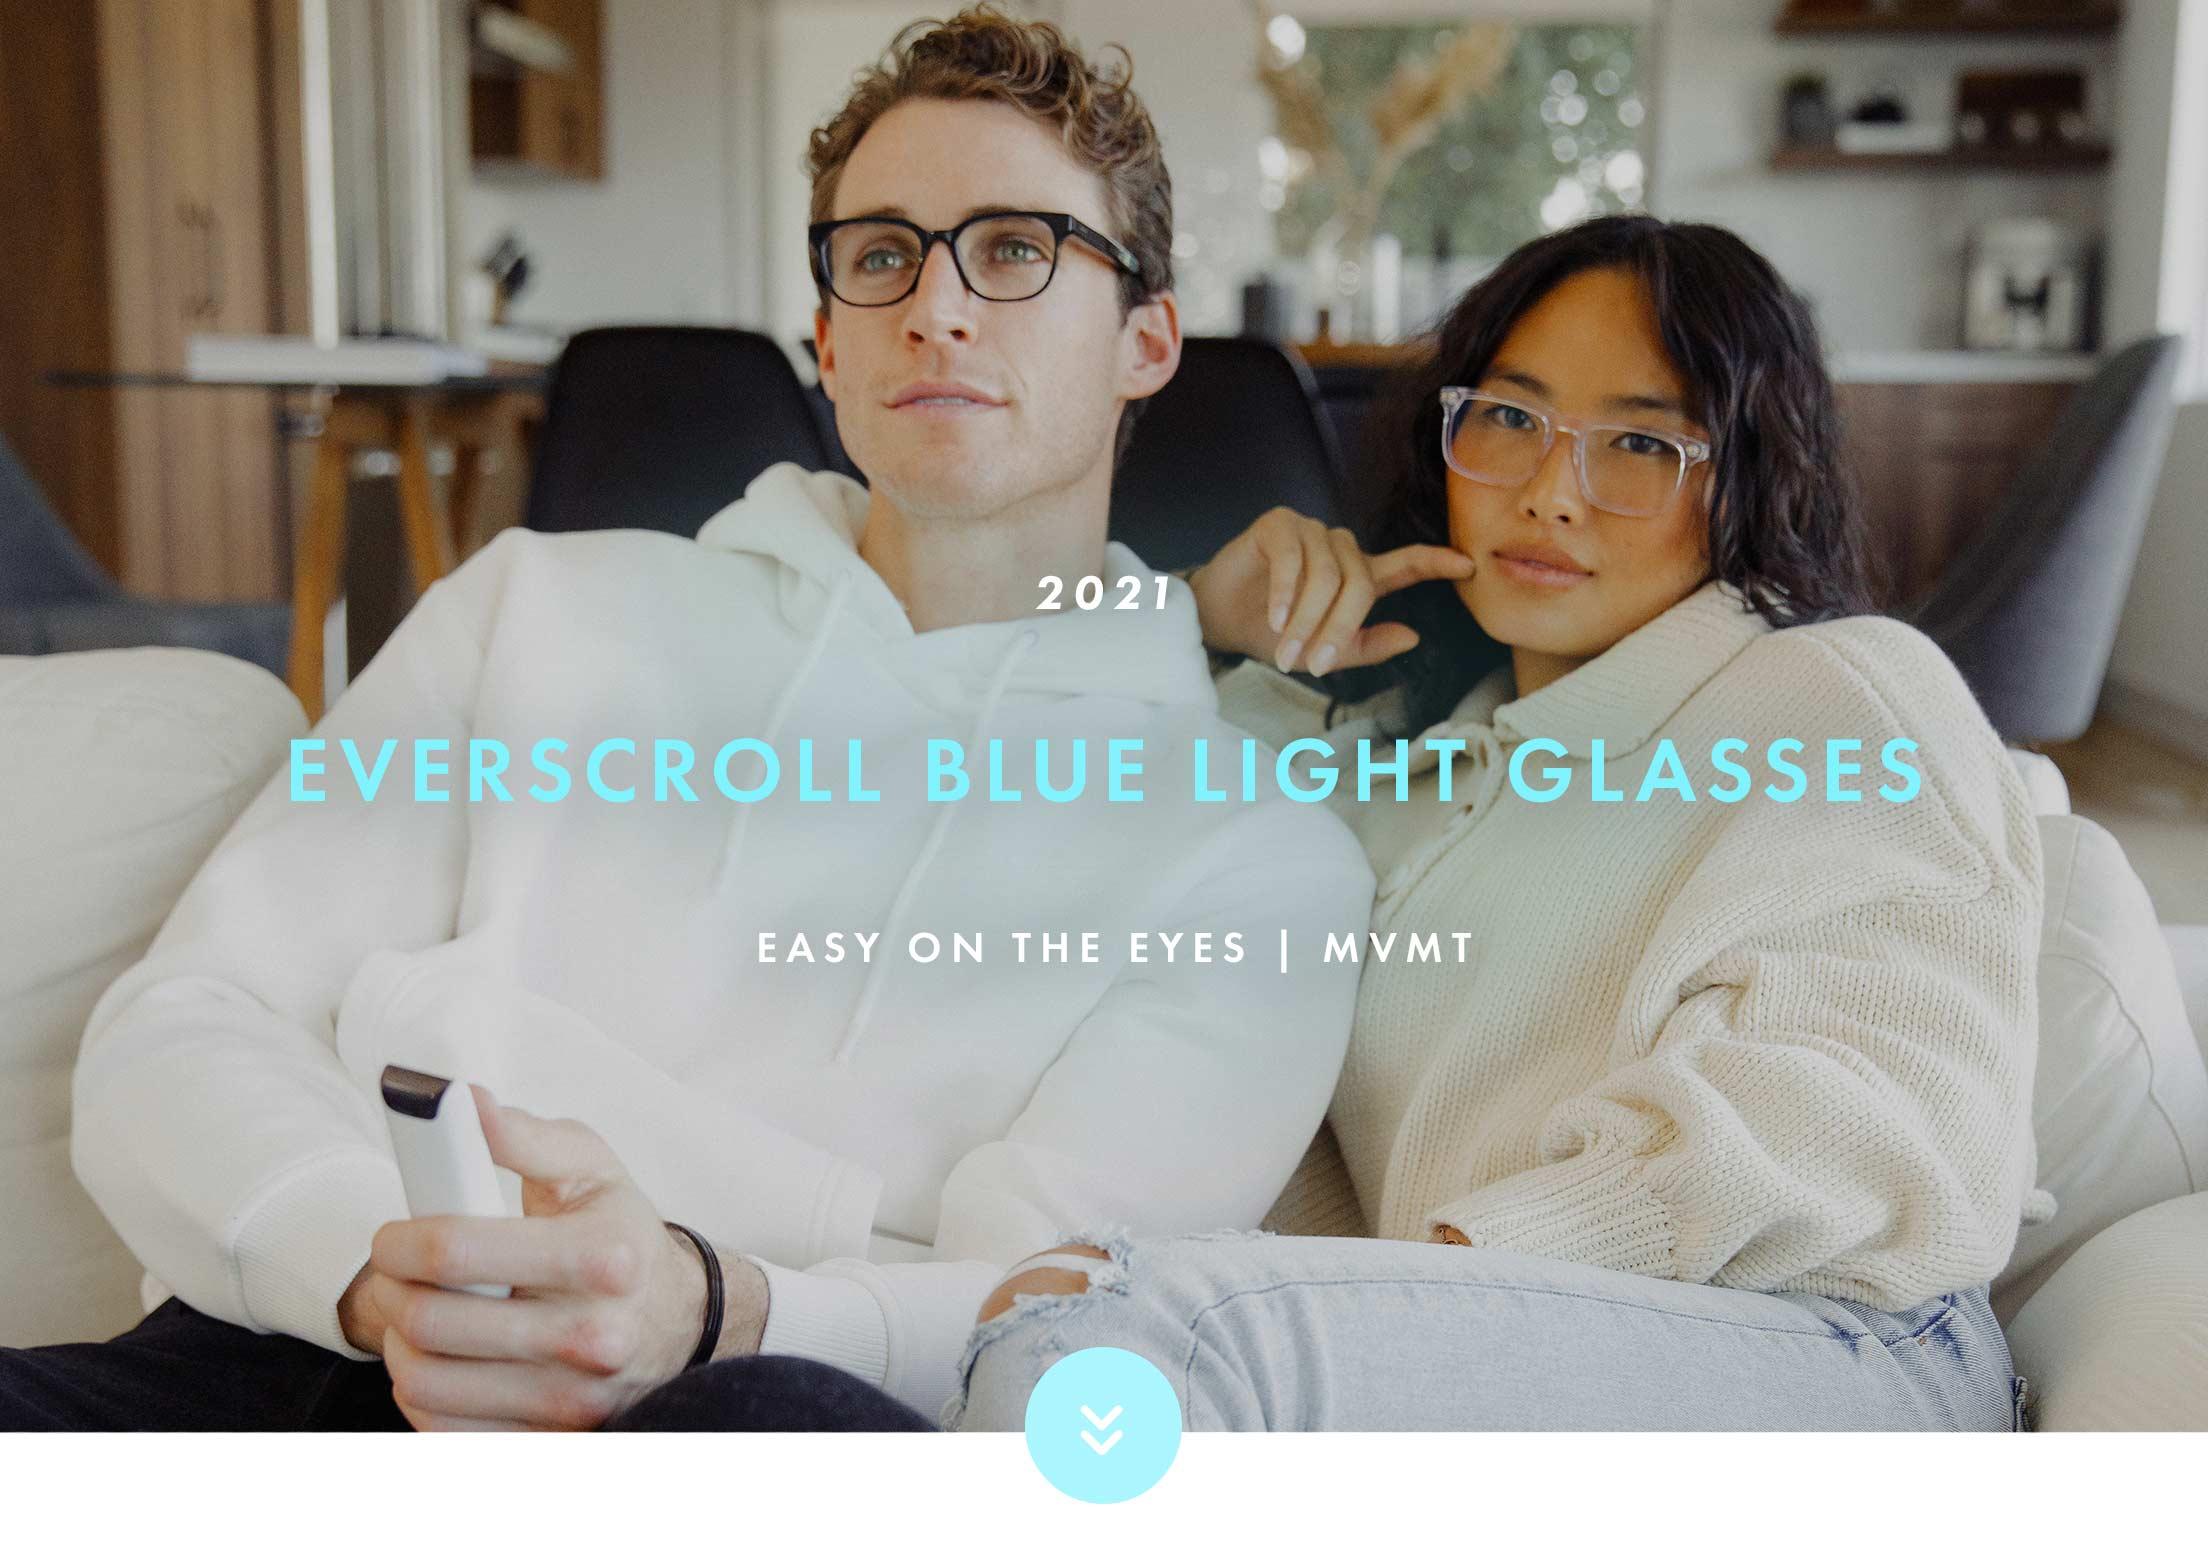 2021 Everscroll Blue Light Glasses